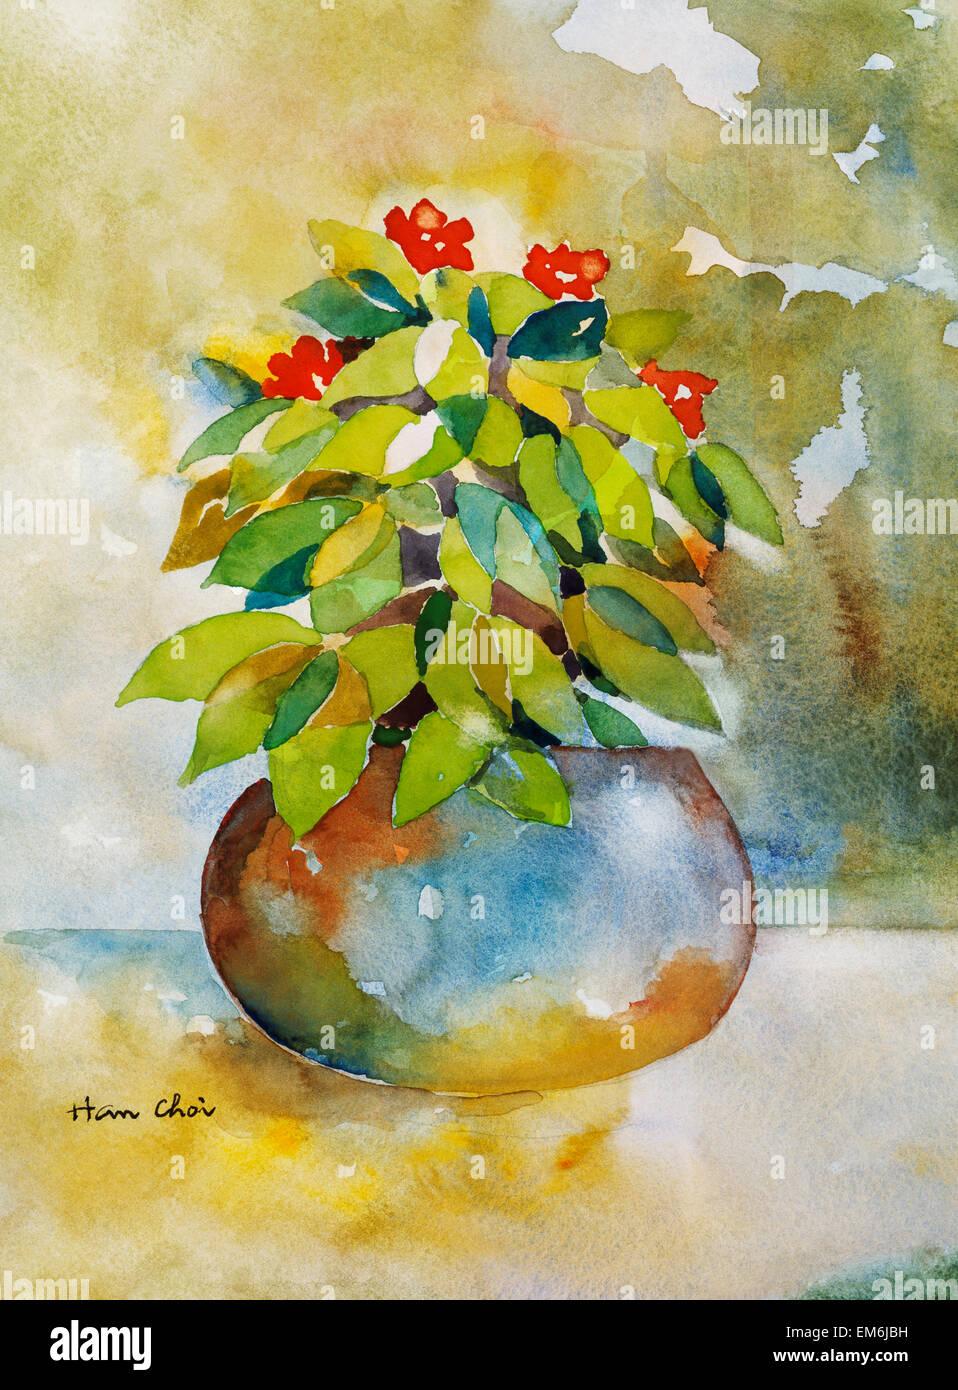 Still Life Watercolor Paintings Stock Photos & Still Life Watercolor ...